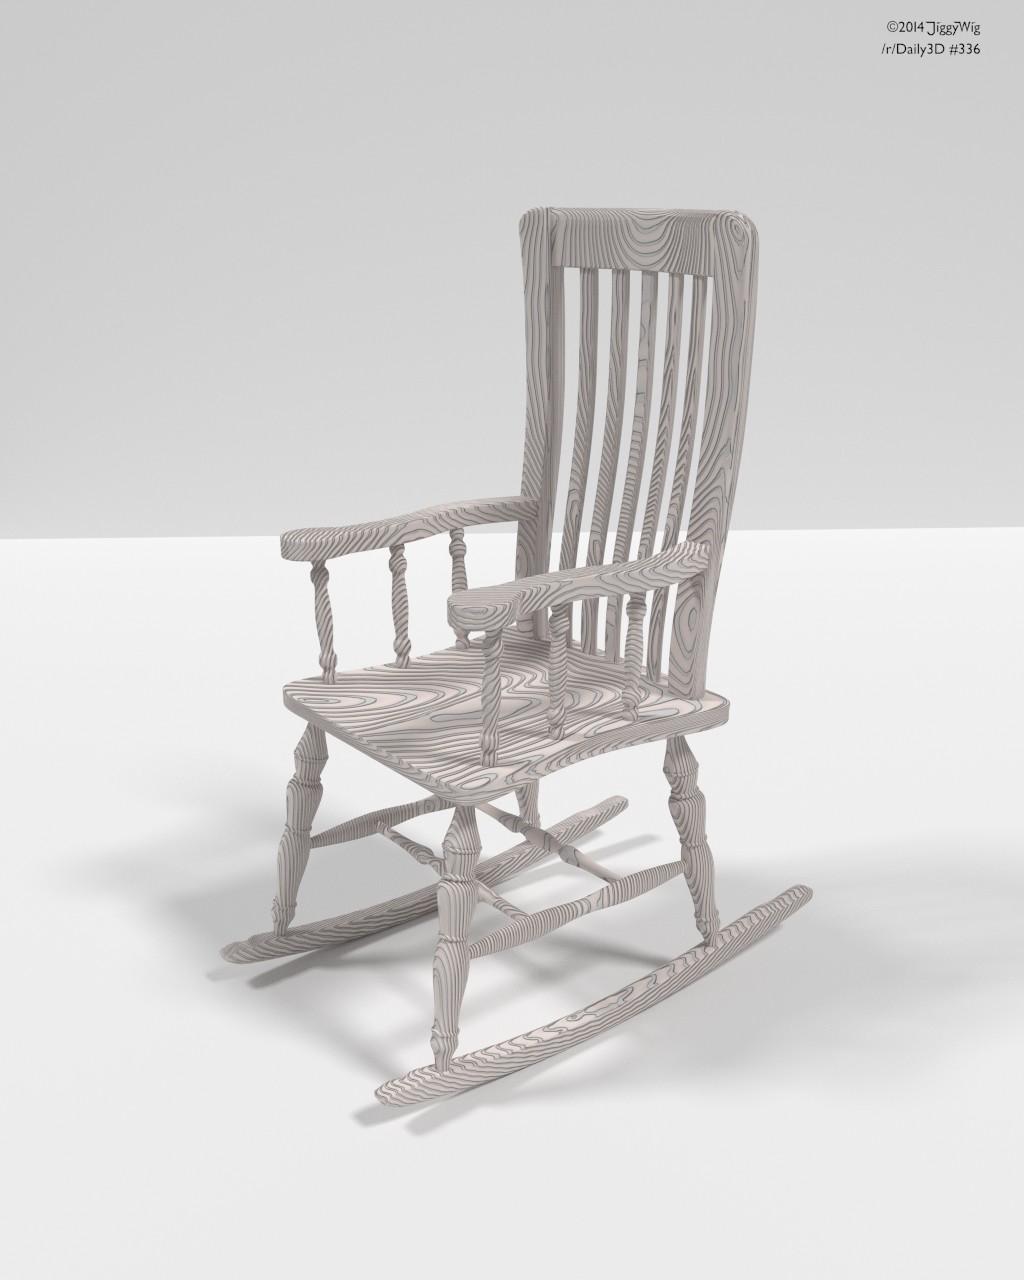 #336 - Rocking chair